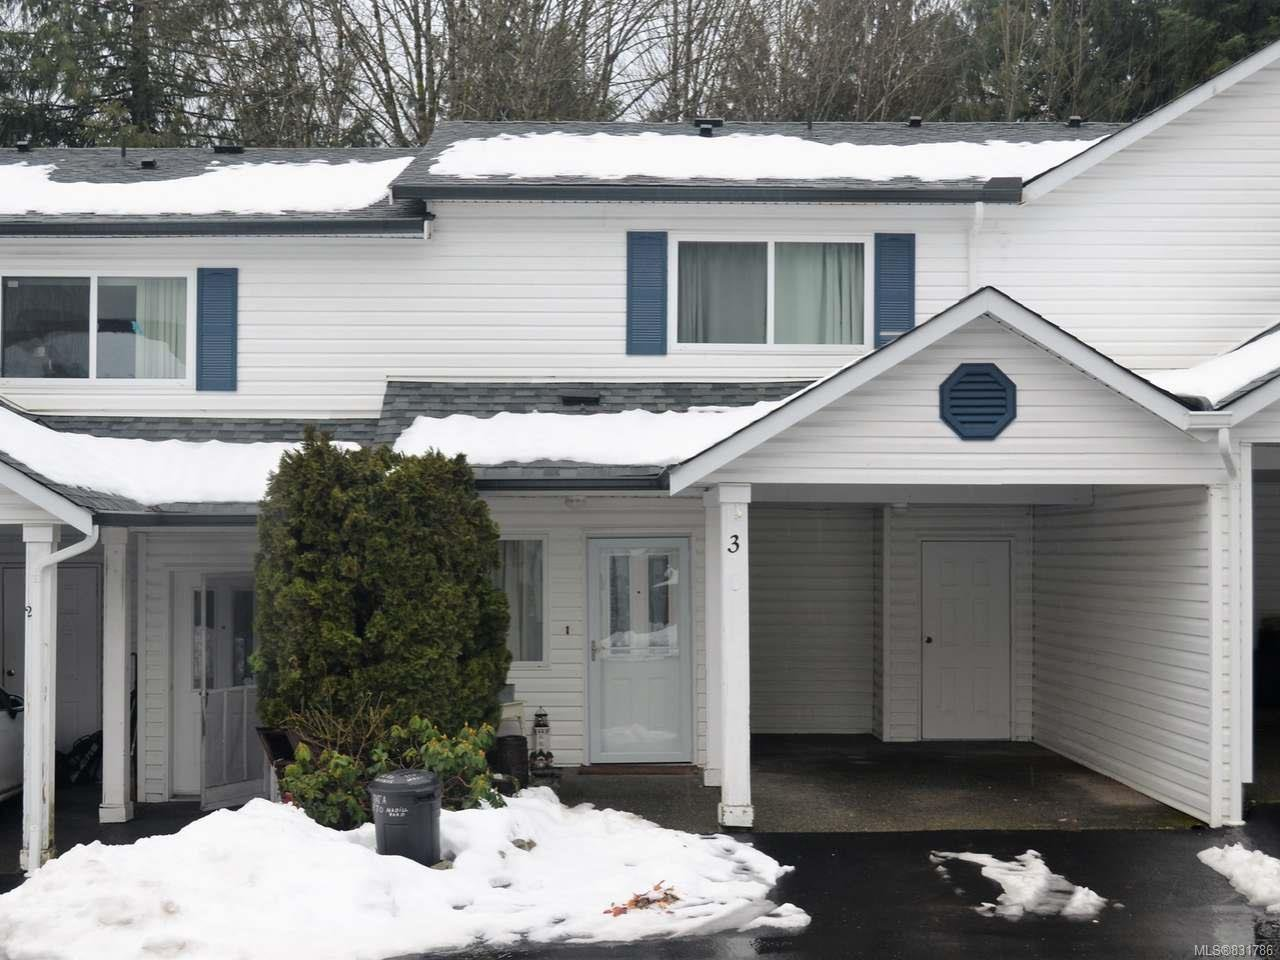 Main Photo: 3 215 Madill Rd in LAKE COWICHAN: Du Lake Cowichan Row/Townhouse for sale (Duncan)  : MLS®# 831786